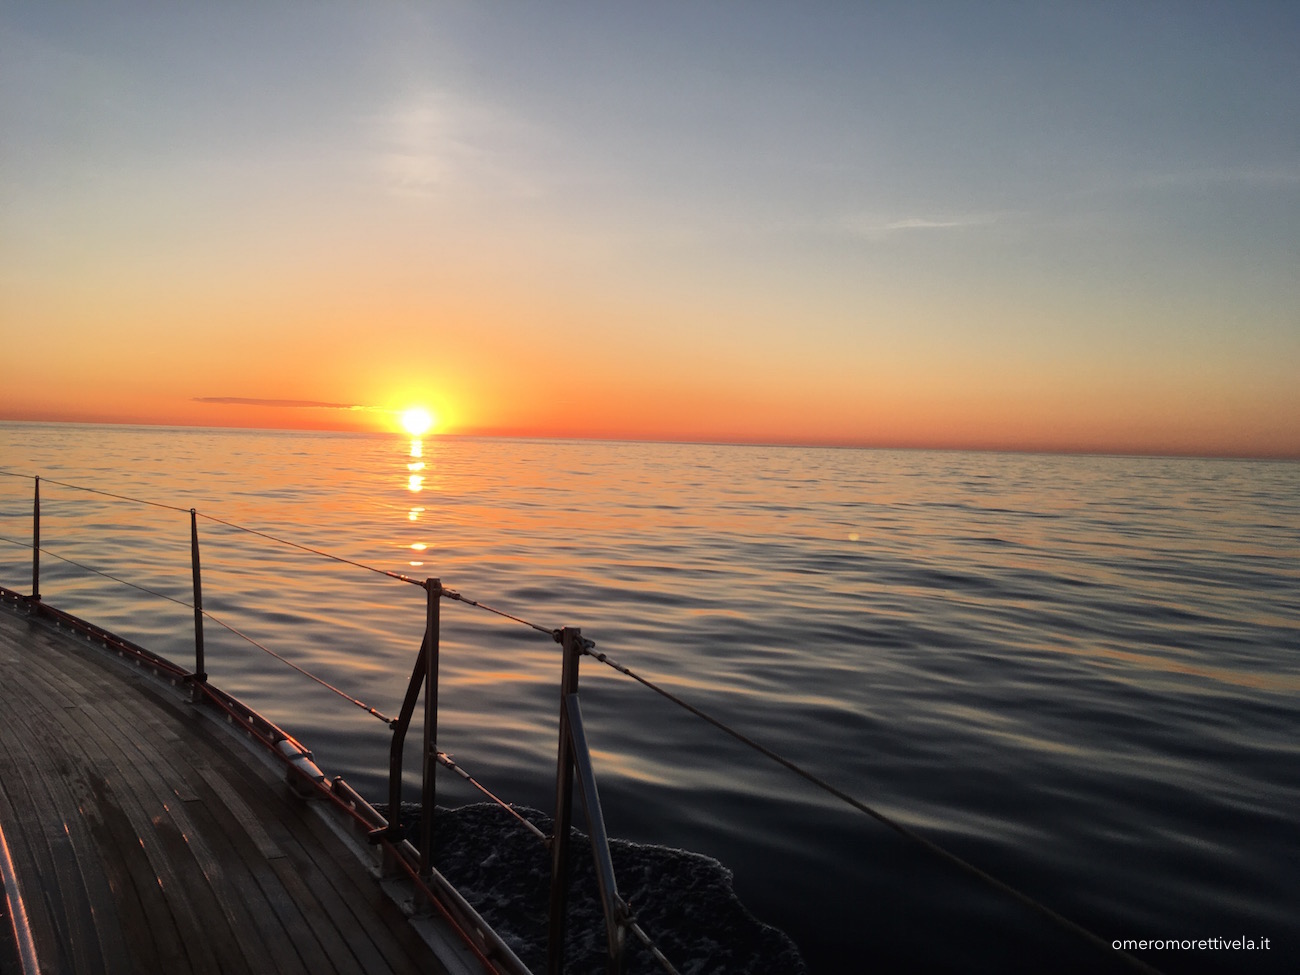 mediterraneo in barca a vela alba in navigazione